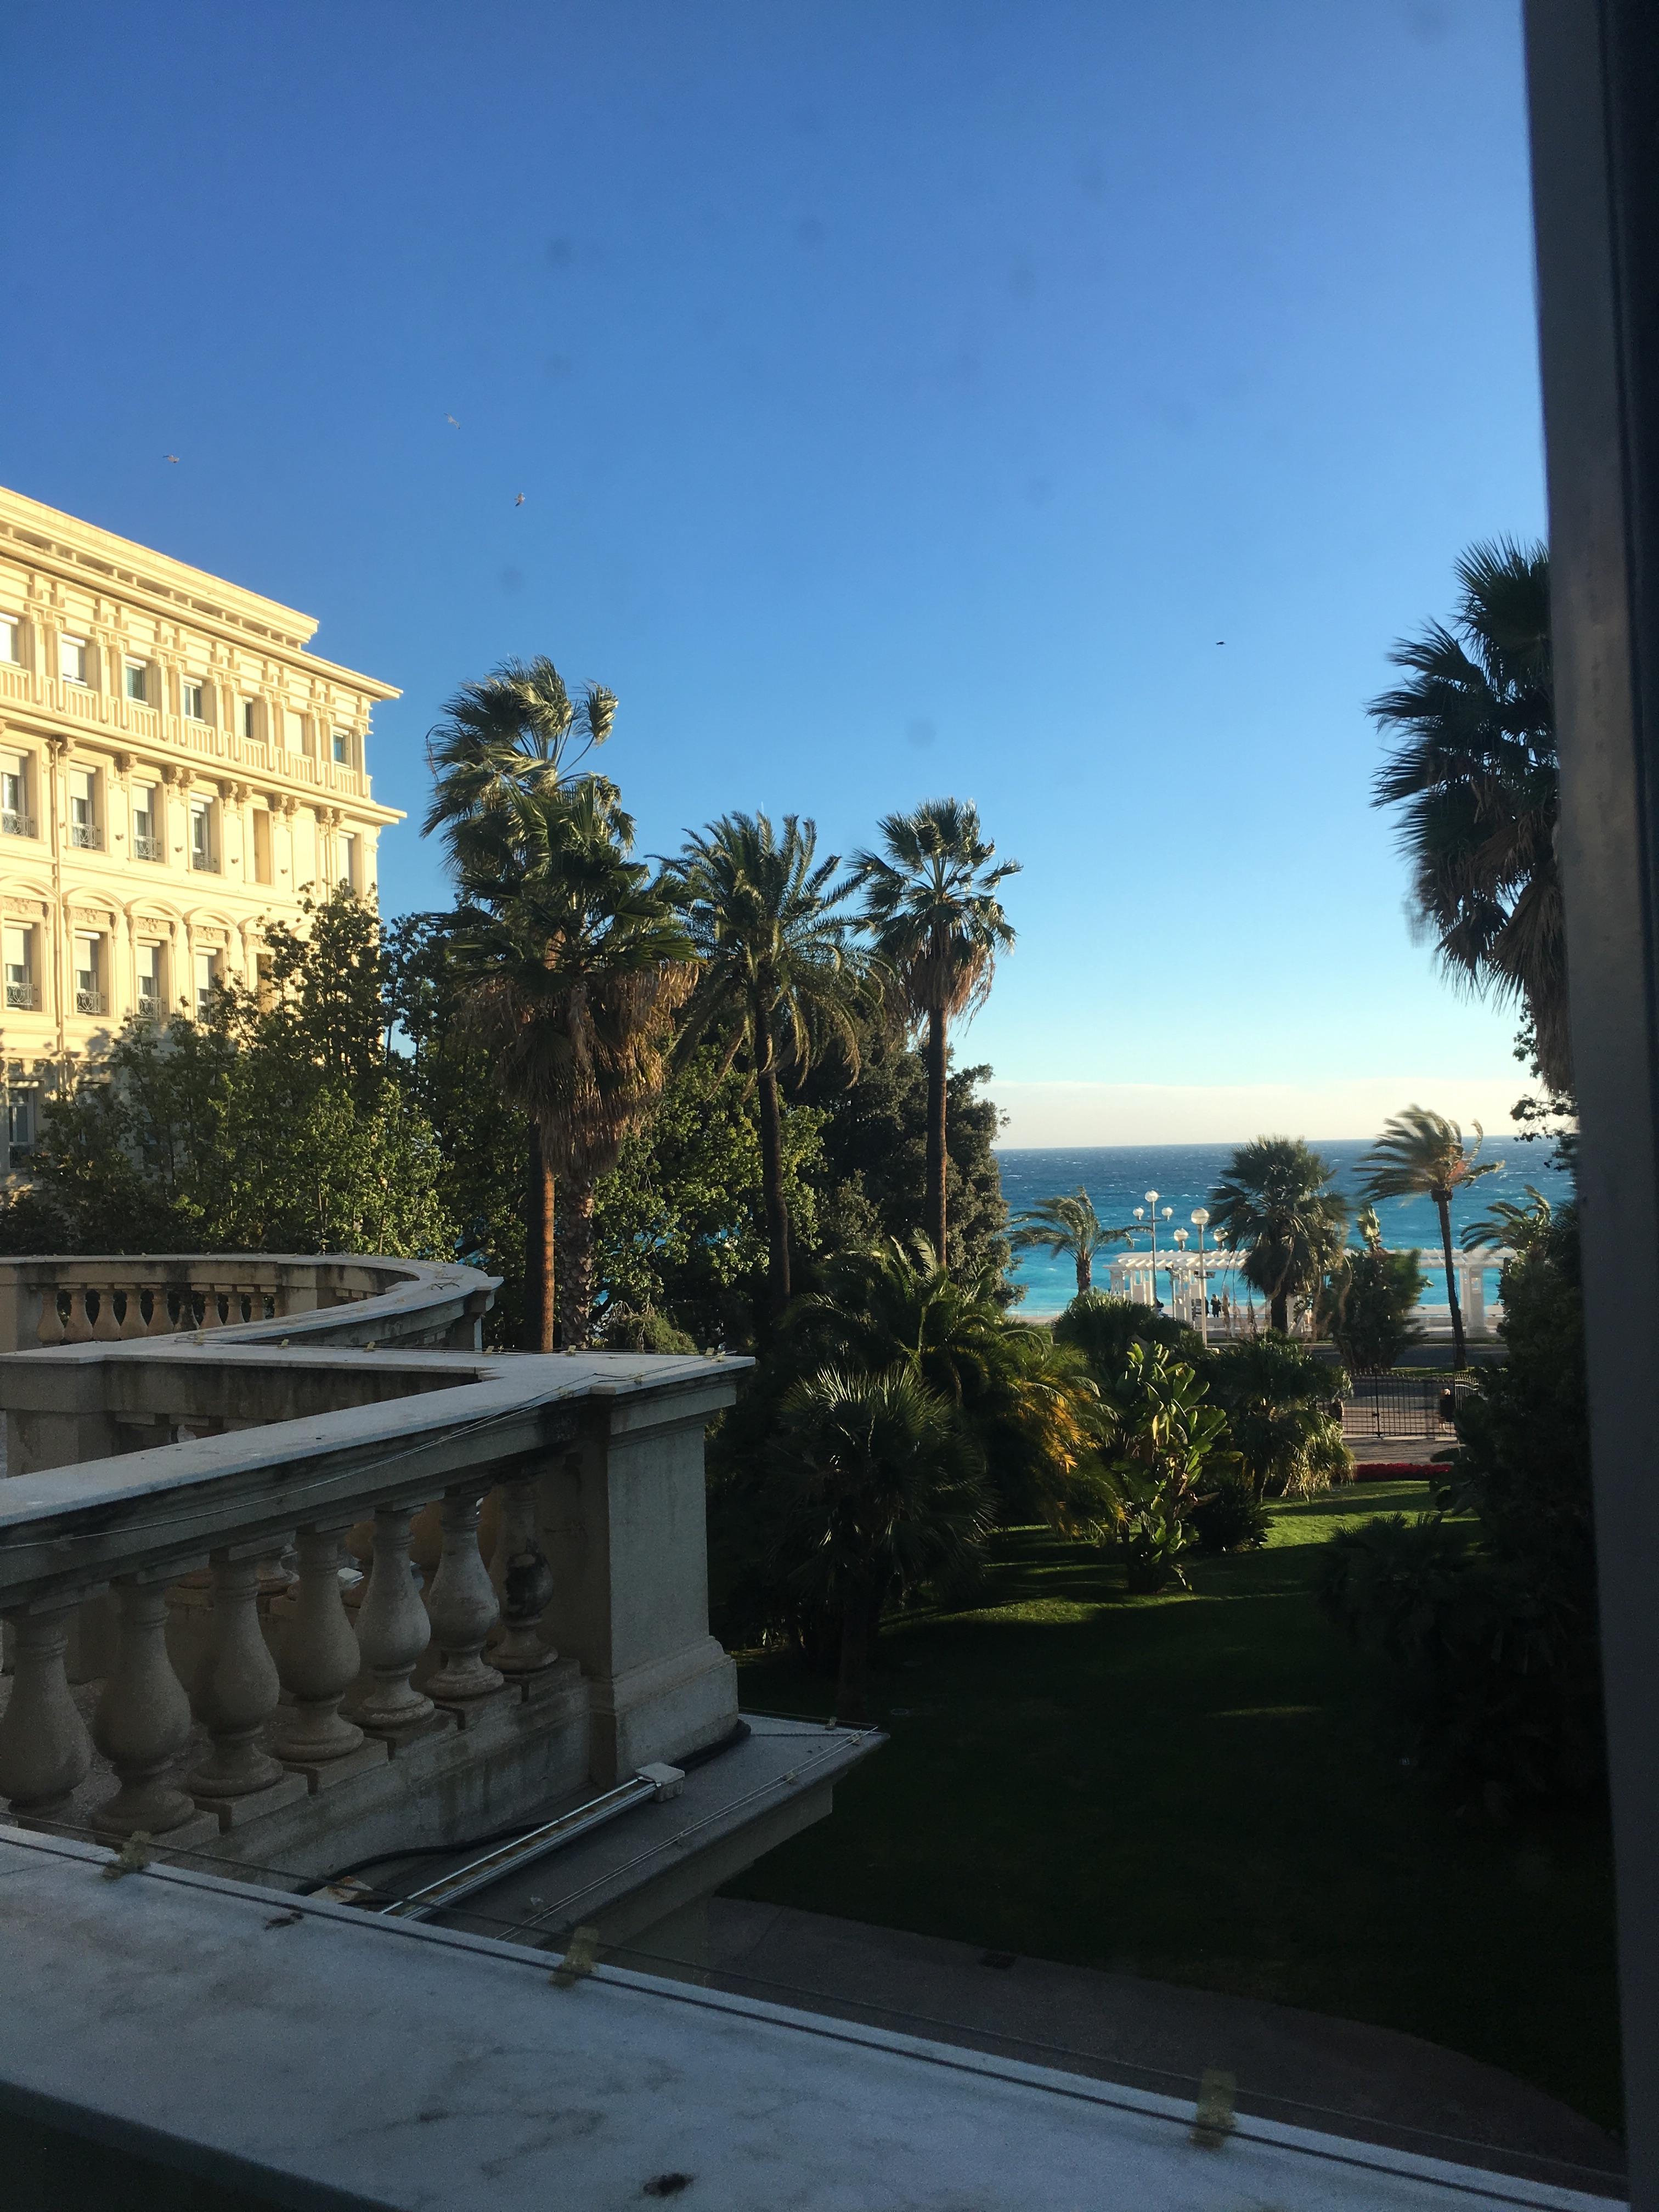 Massena Museum view from window